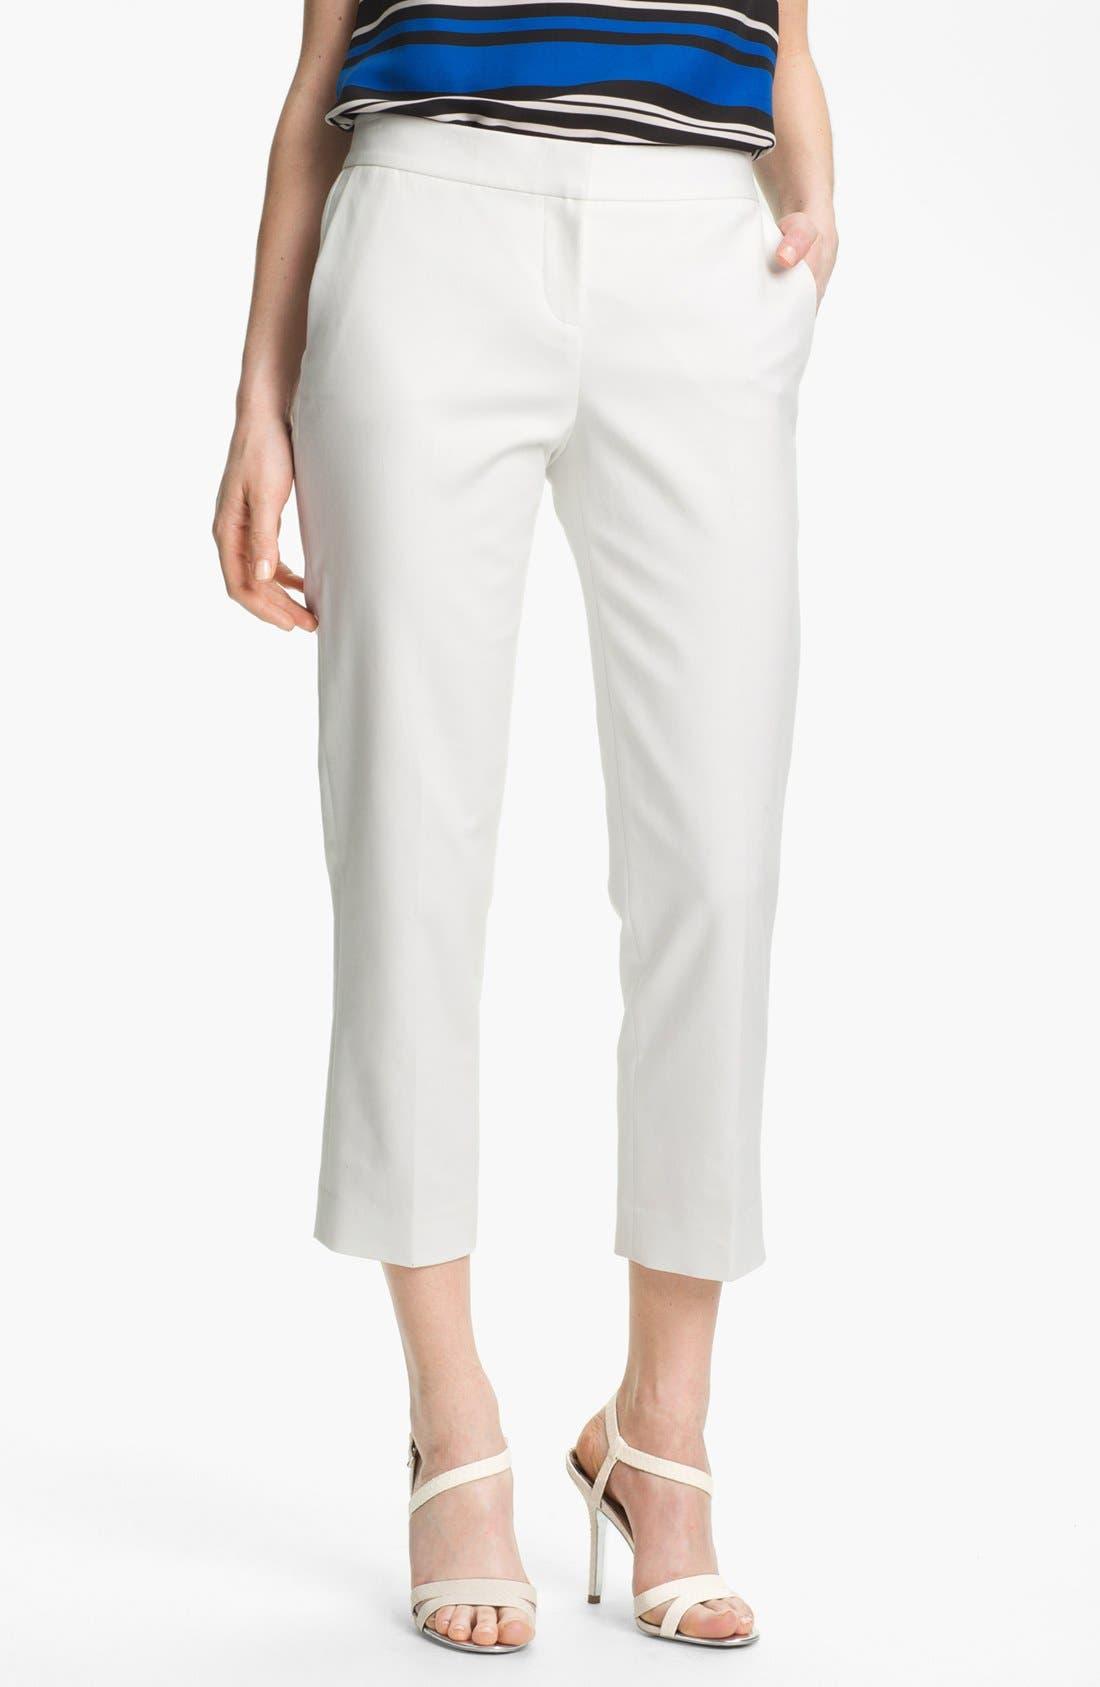 Alternate Image 1 Selected - Vince Camuto Skinny Crop Pants